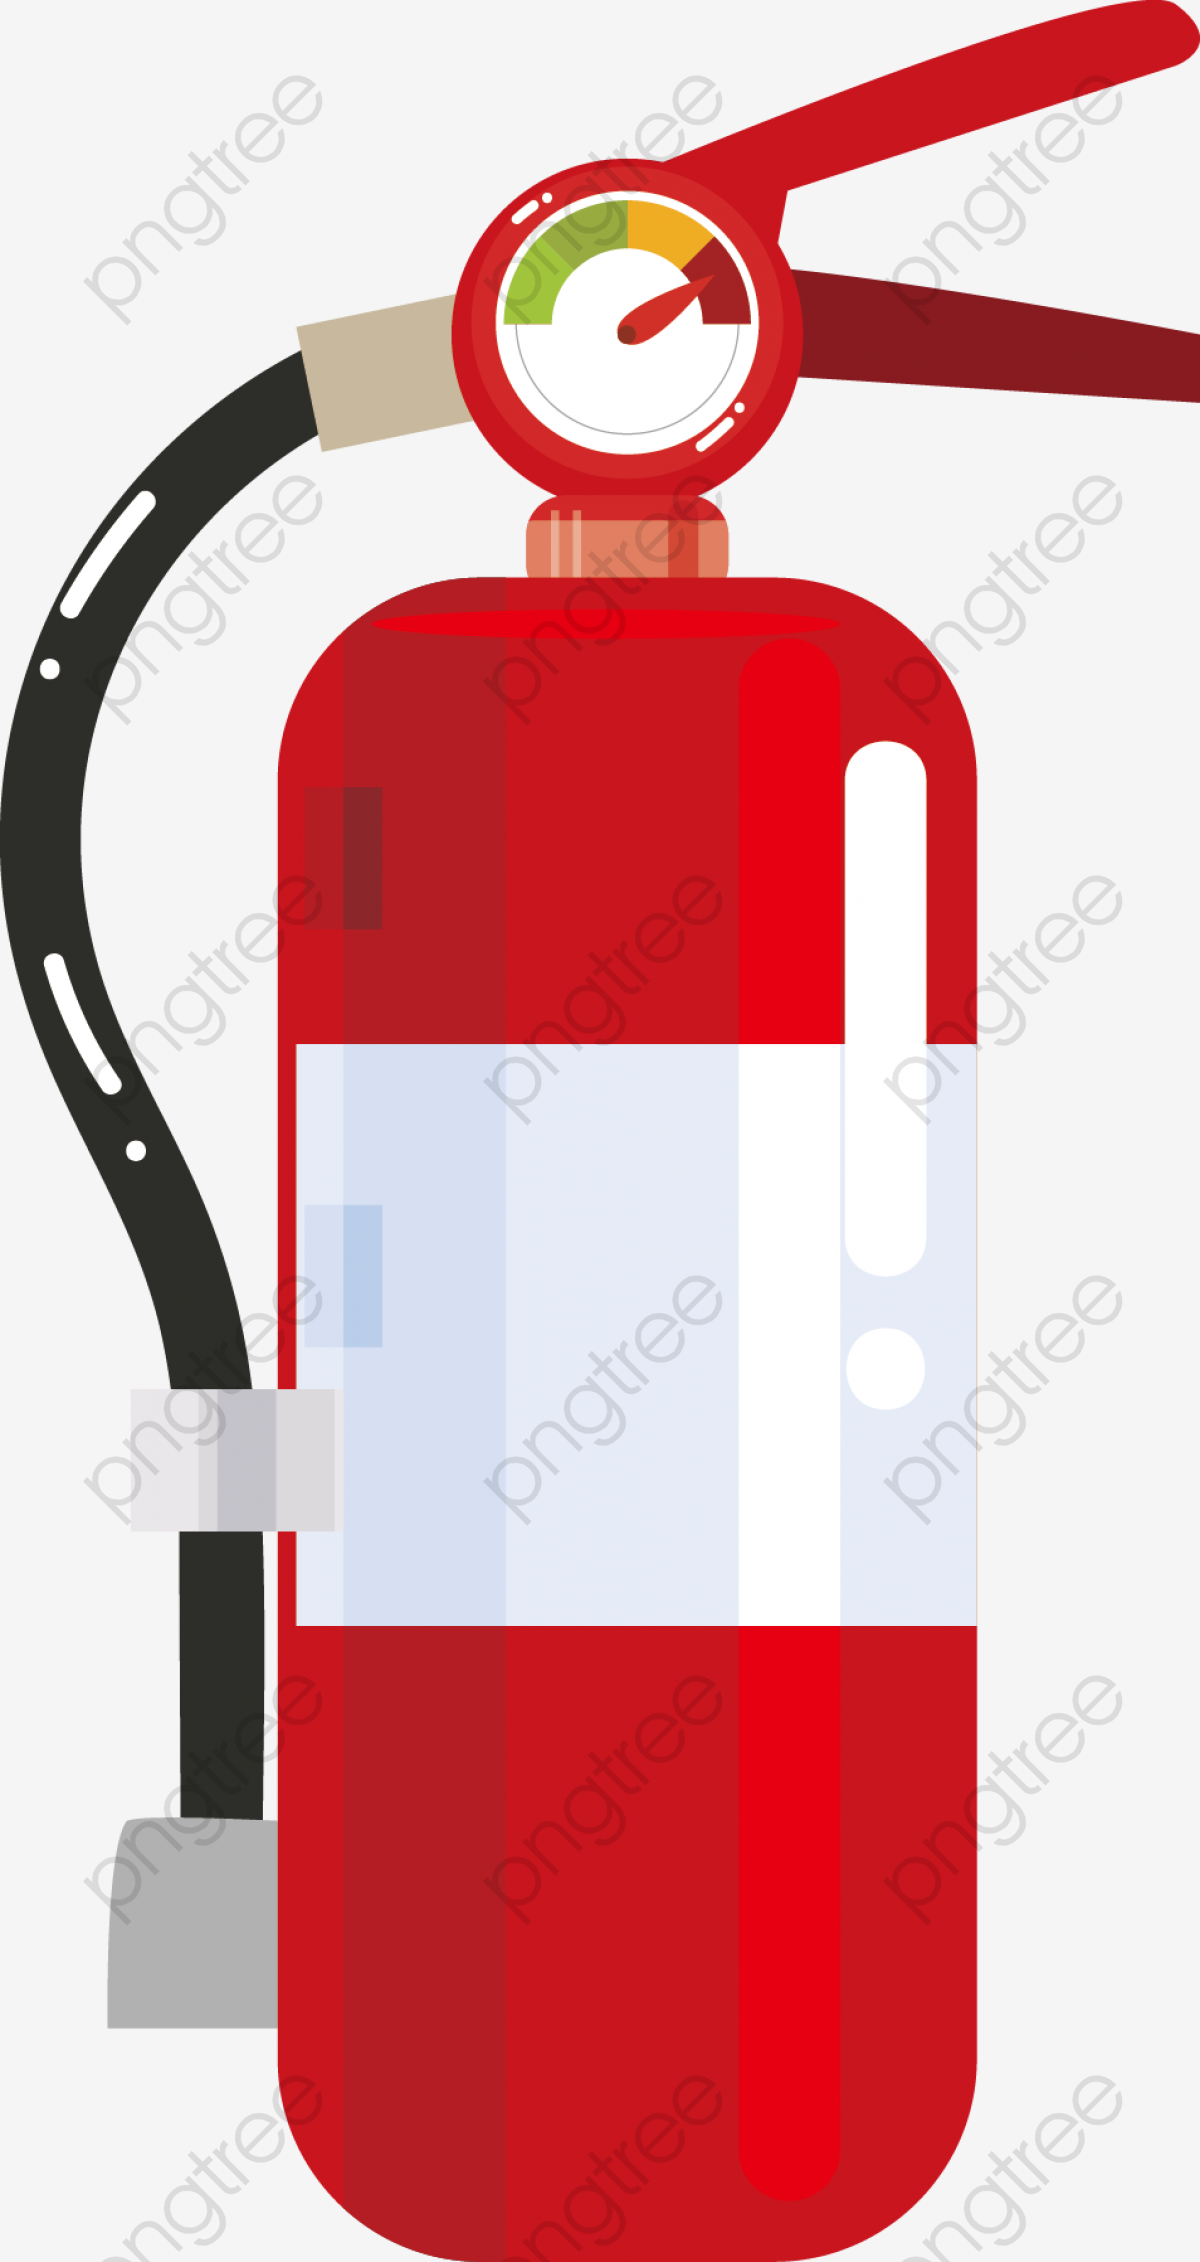 Extintores De Incêndio Vector, Extintor De Incêndio, De Combate A.